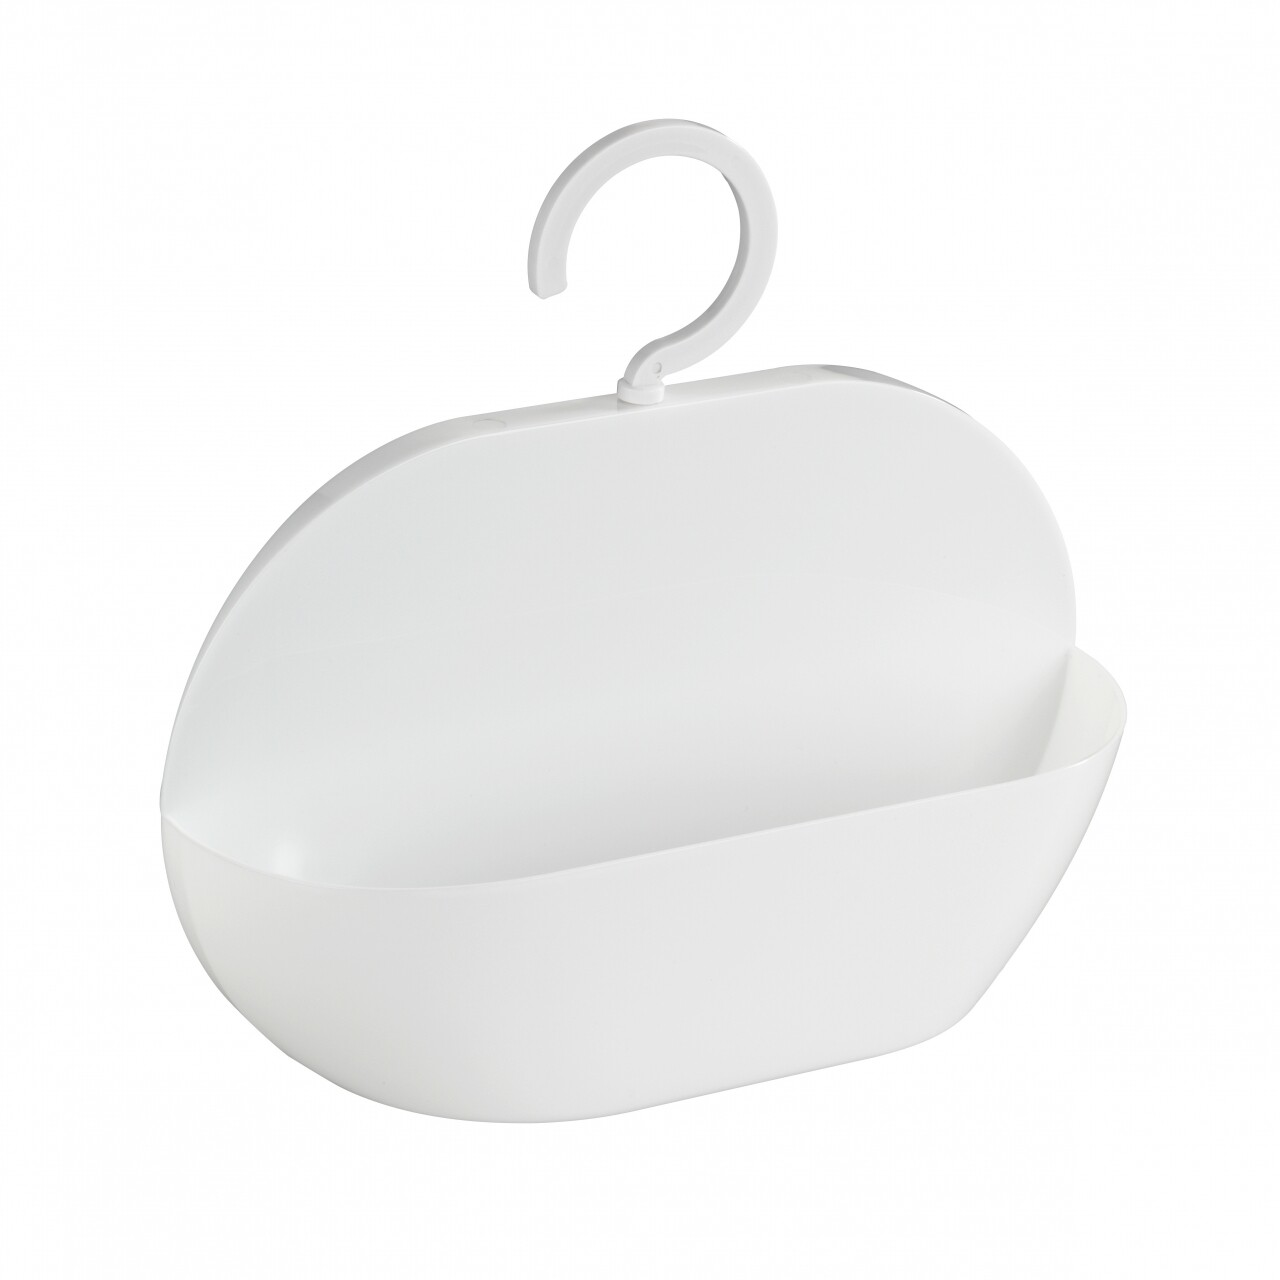 Suport accesorii pentru dus Cocktail, Wenko, 26 x 9 cm, polistiren/ABS, alb